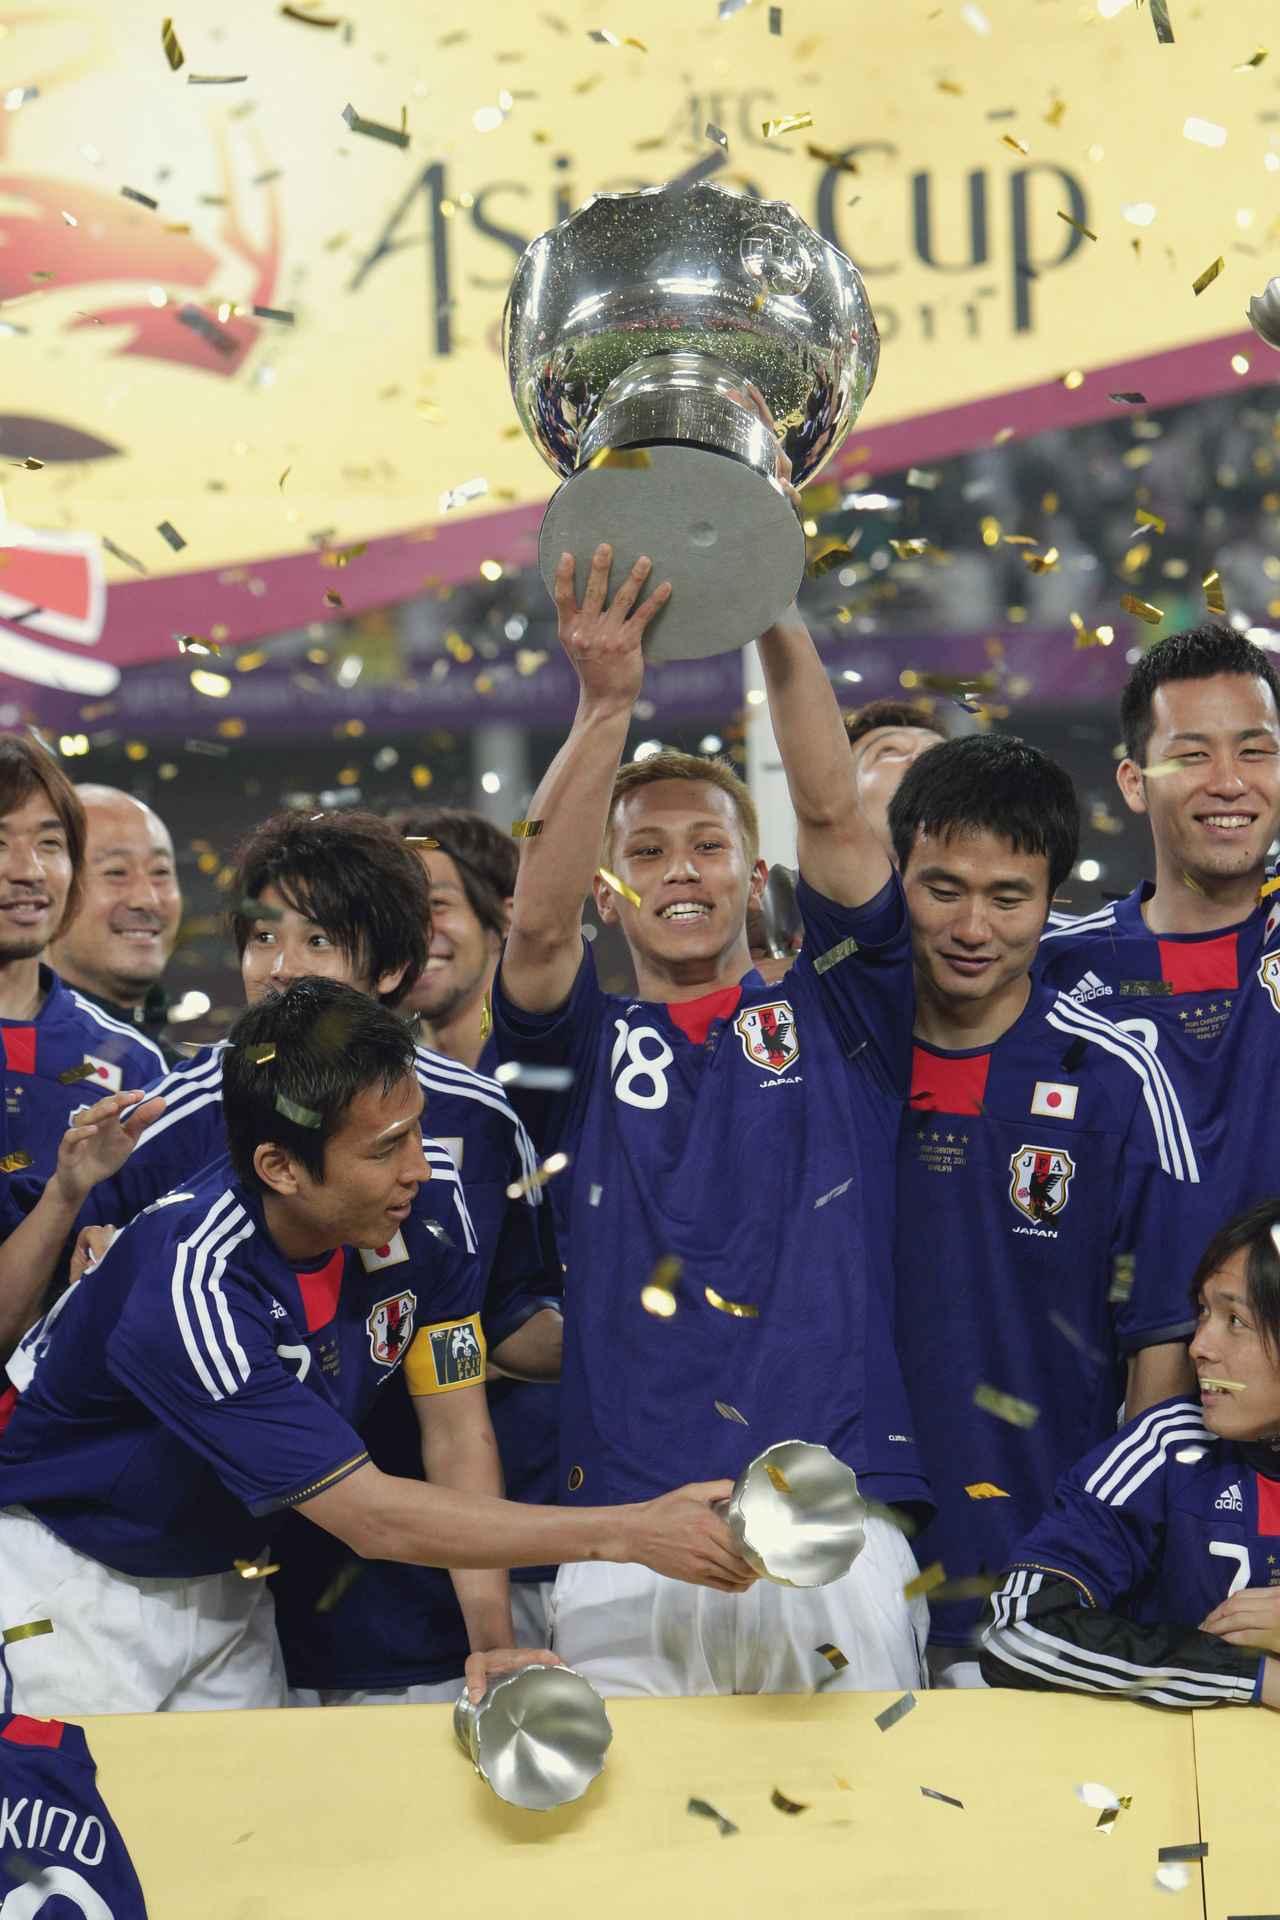 Images : 6番目の画像 - 幾多の苦闘を乗り越え、団結してアジア王座を奪還した日本(写真◎小山真司) - ベースボール・マガジン社WEB